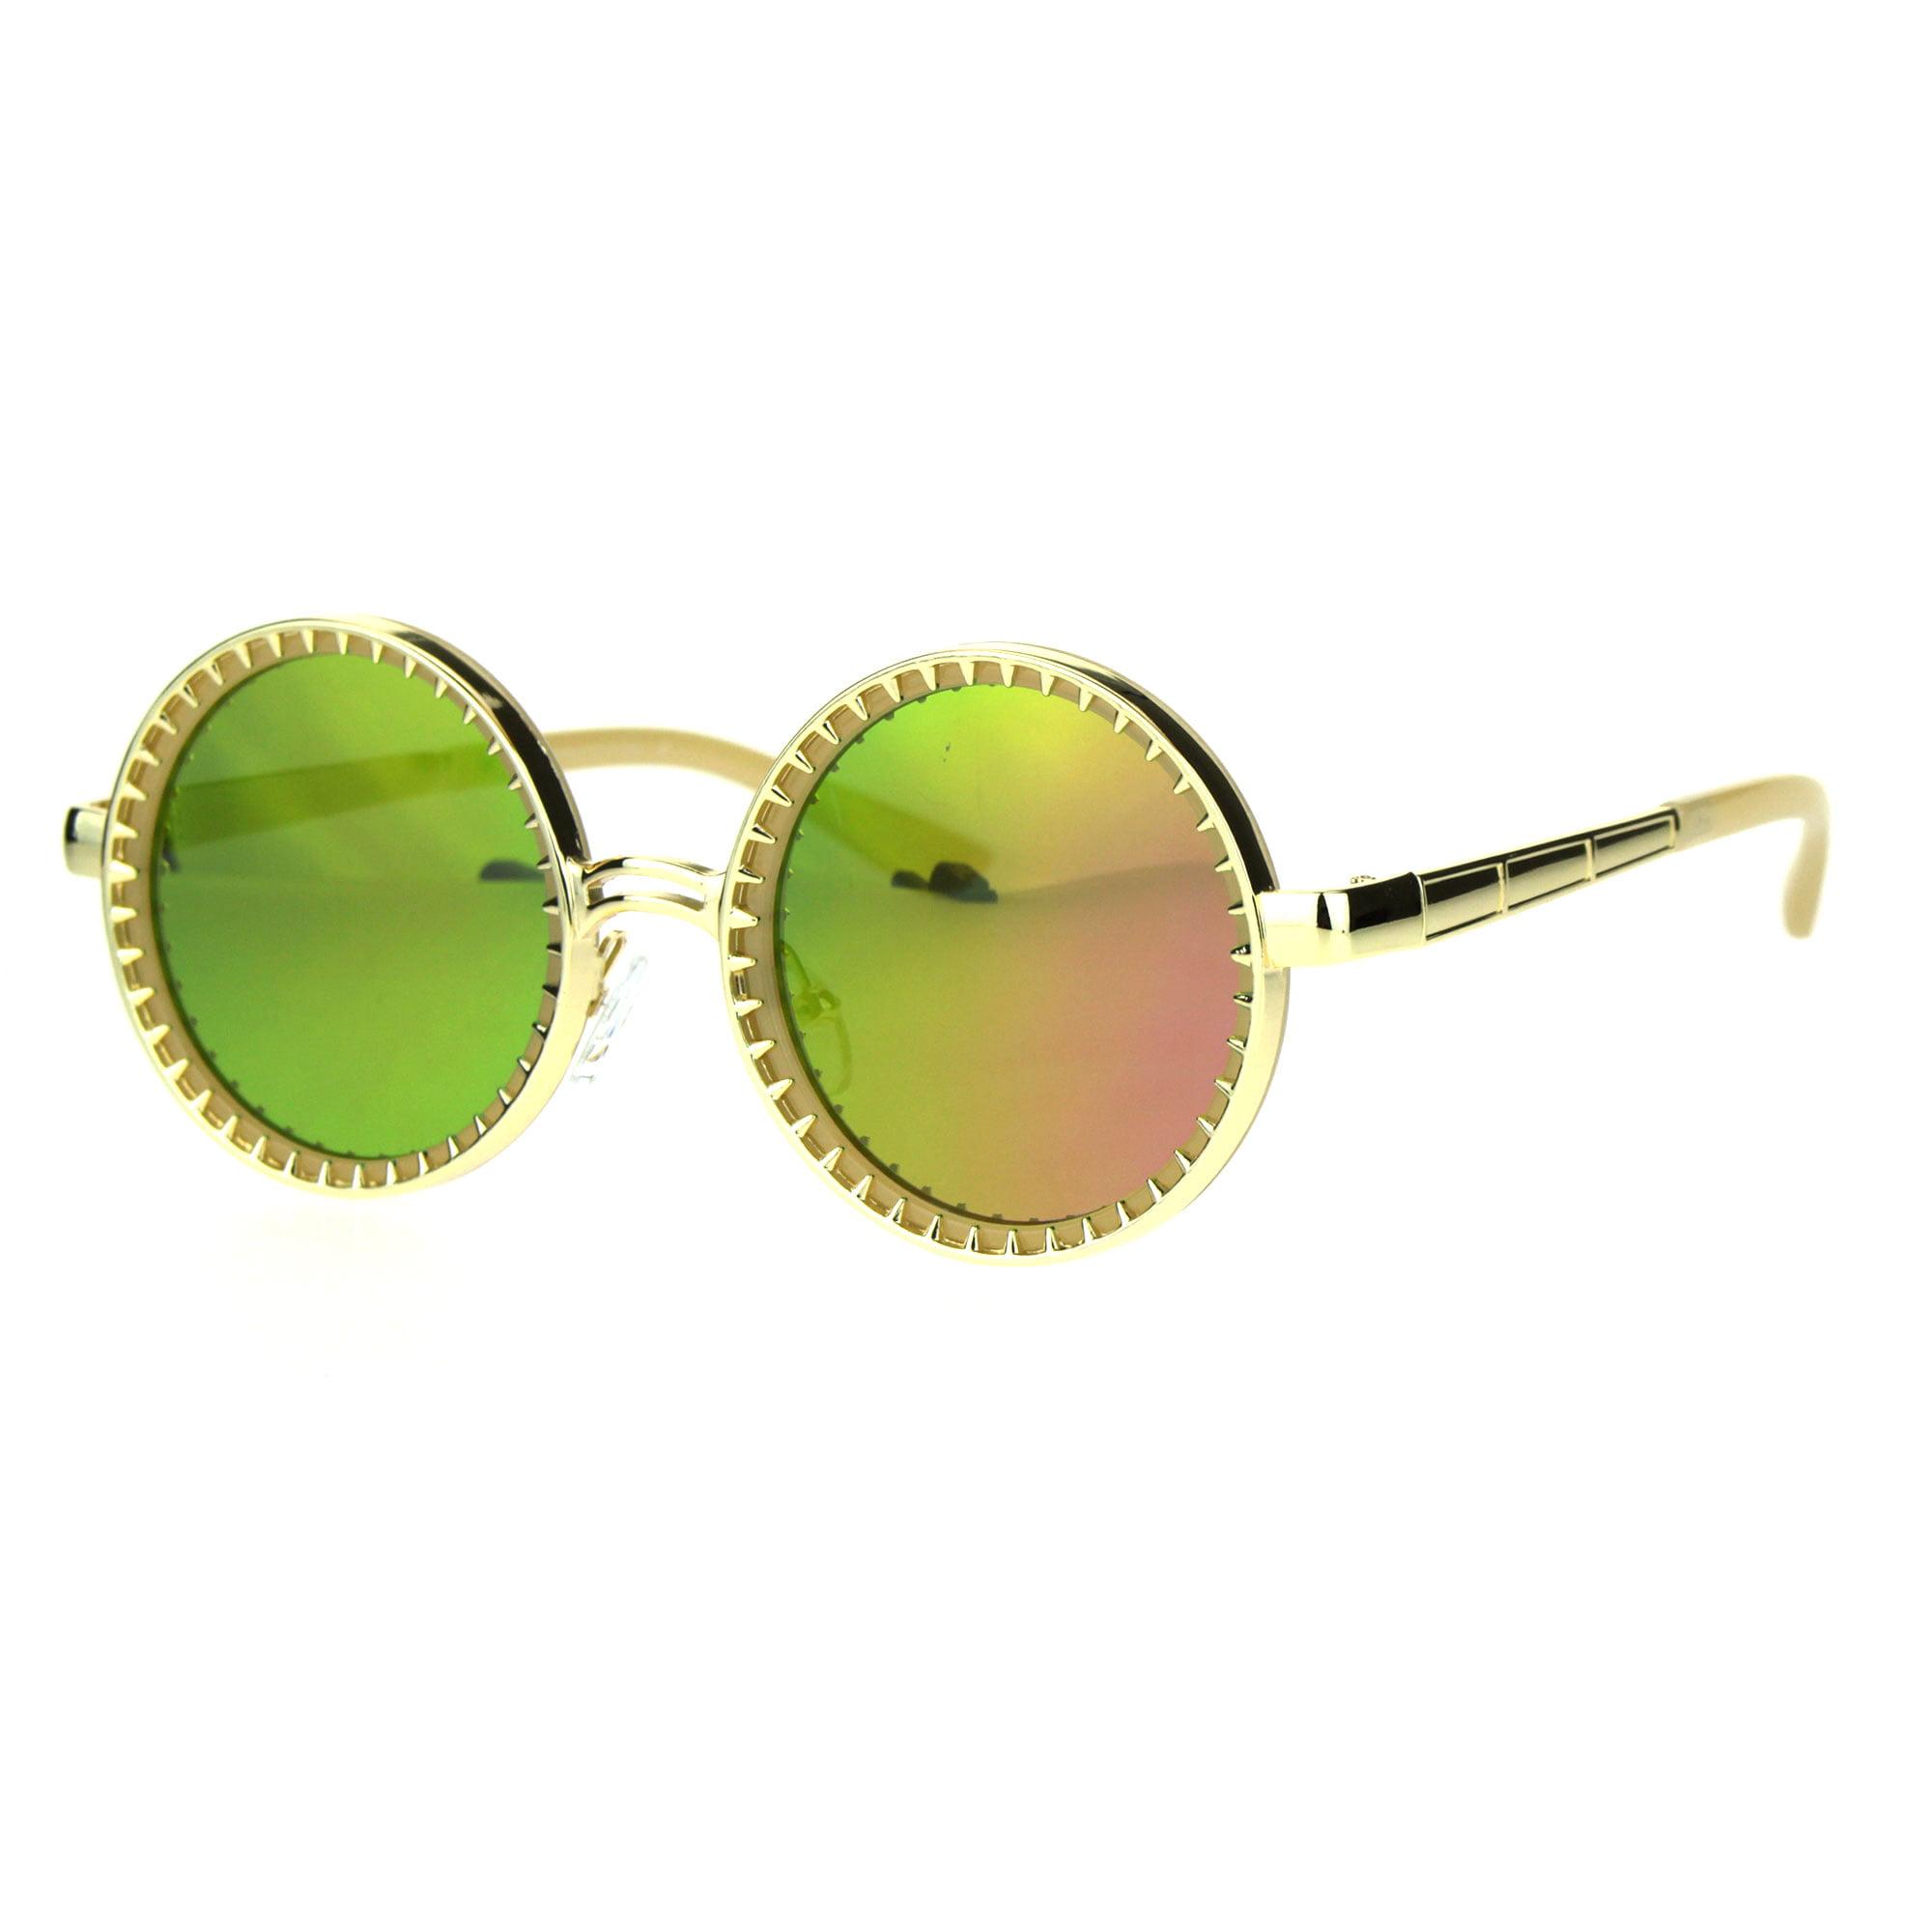 Victorian Gold Circle Steampunk Fuchsia Color Mirror Round Lens Sunglasses qUzpVSMG